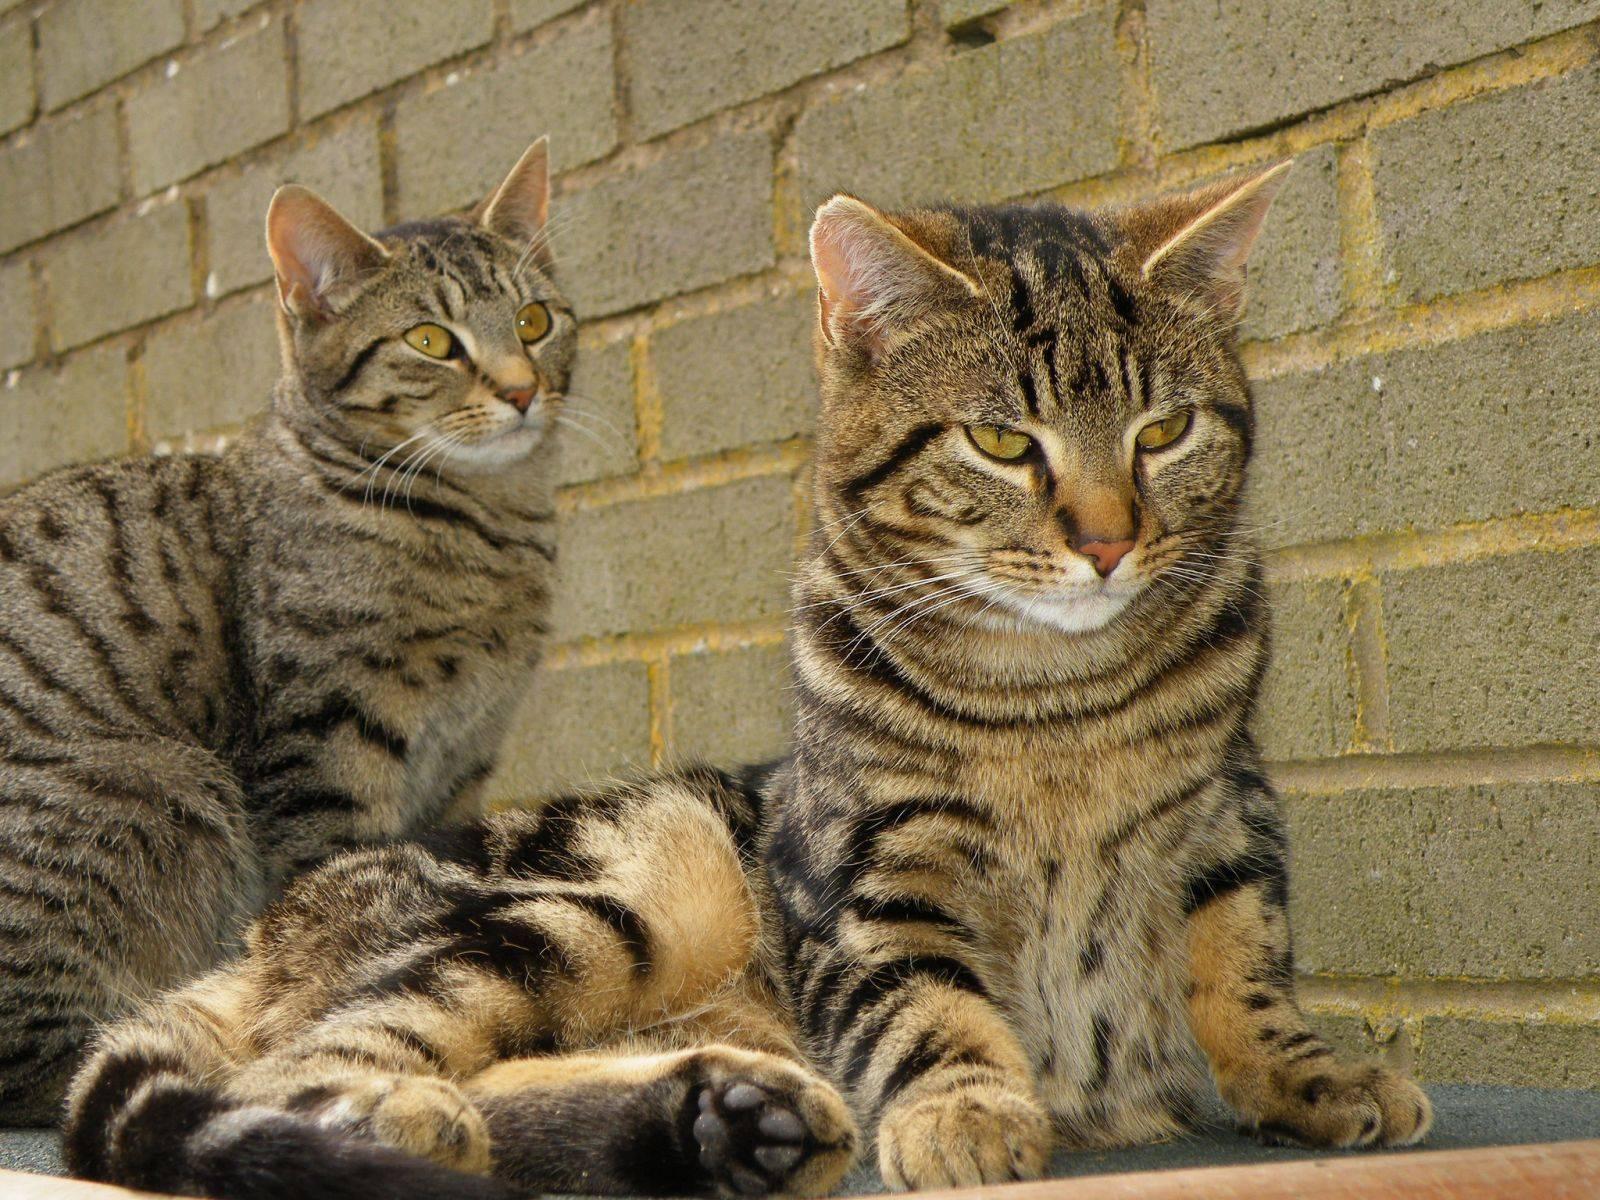 Азиатская табби: фото, описание породы кошек, характер, цена